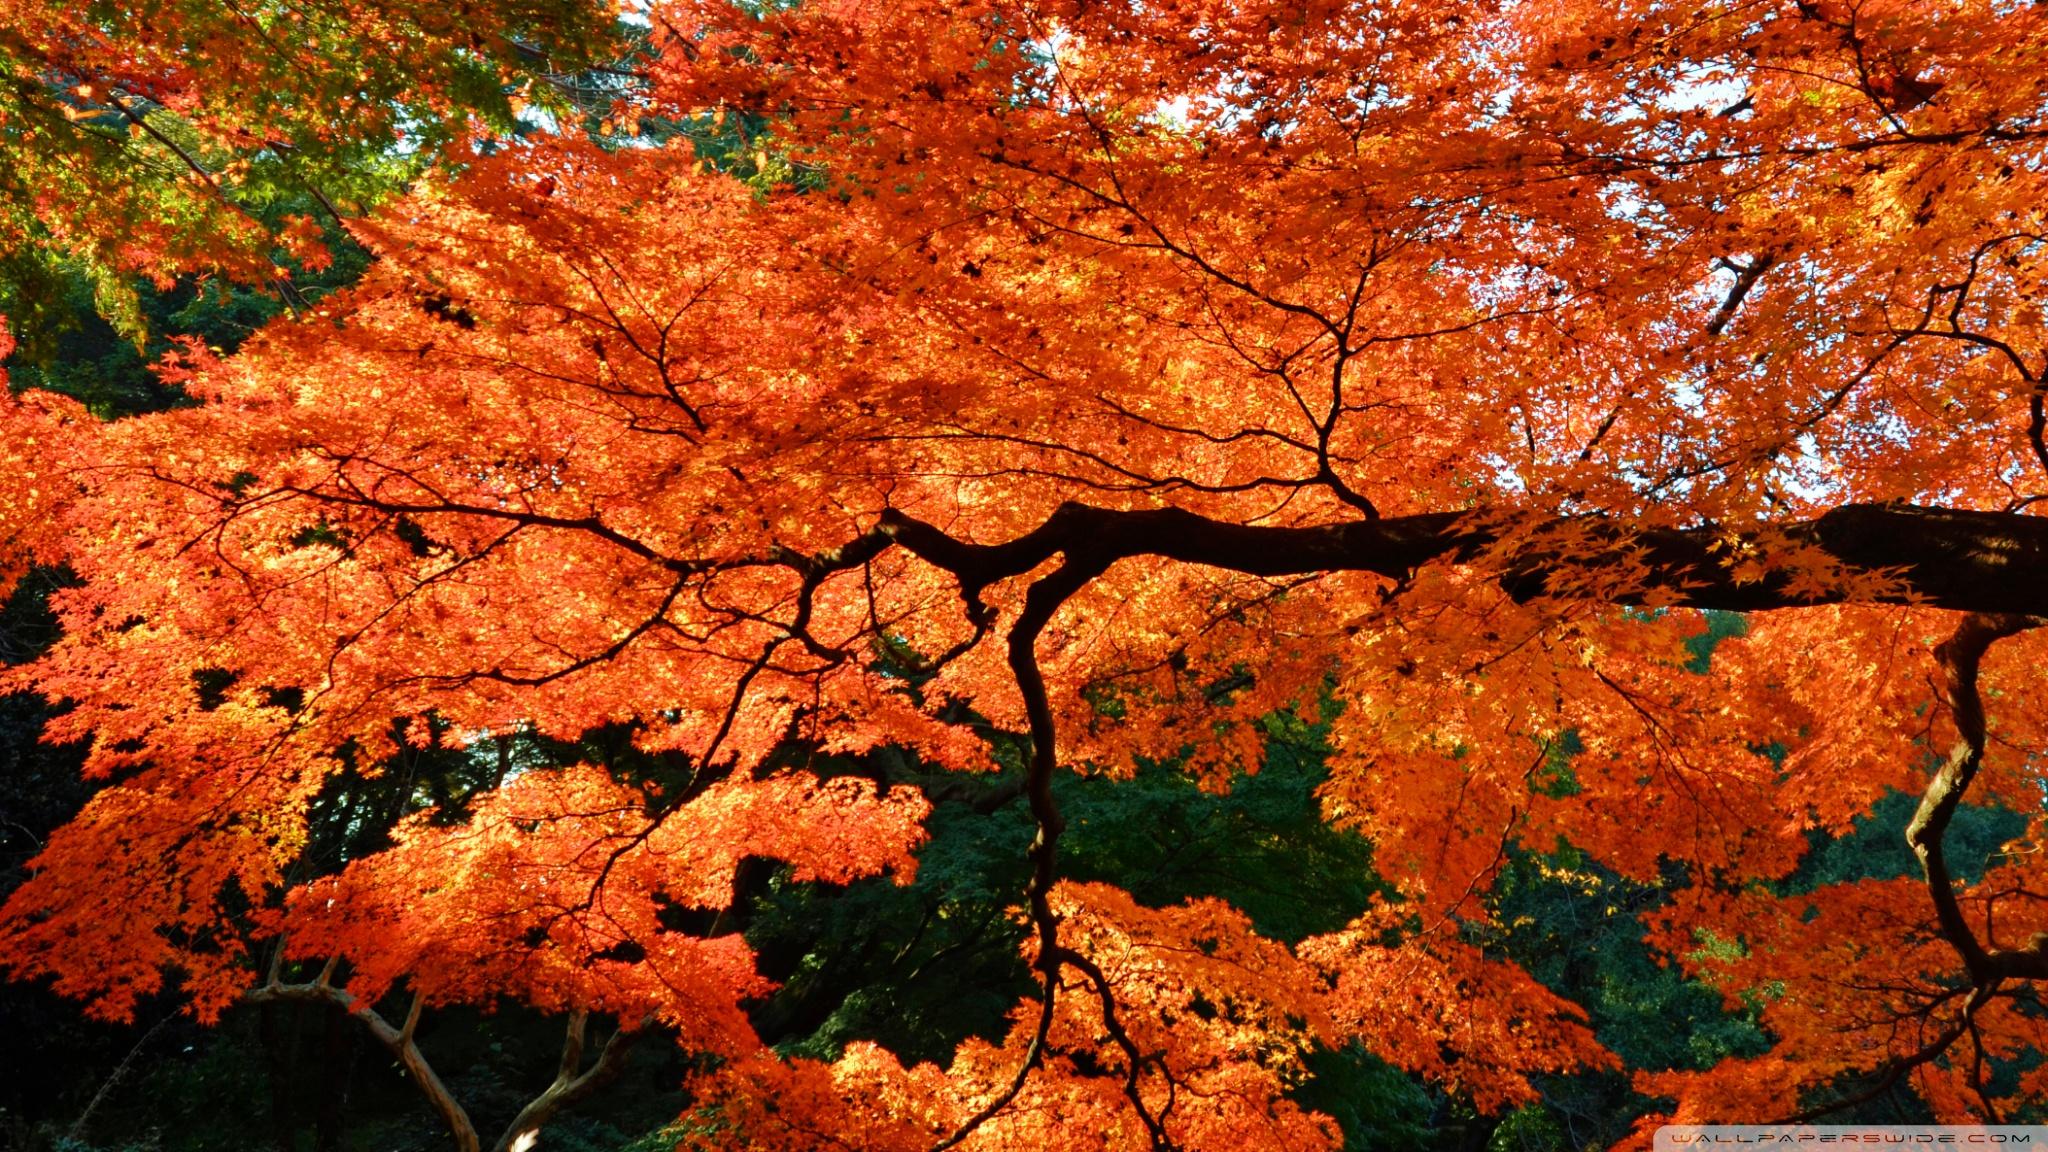 Fall Season Computer Wallpaper Beautiful Japanese Maple Tree 4k Hd Desktop Wallpaper For